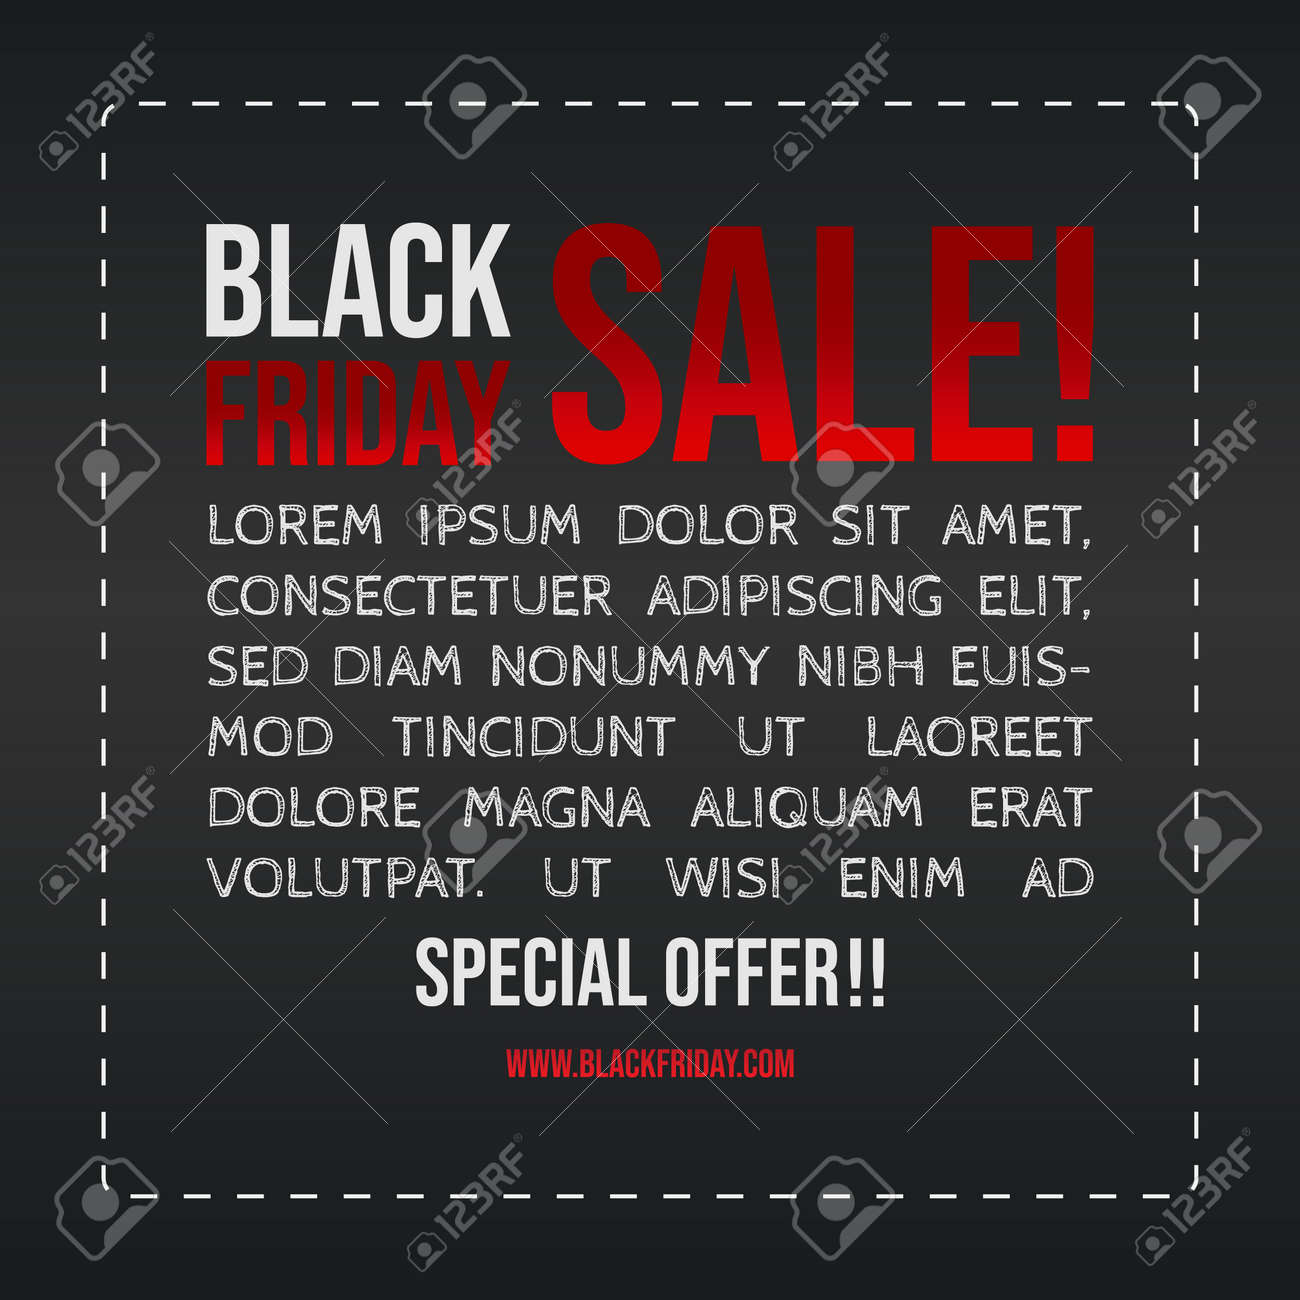 Black Friday Sale banner vector image. Vector design template. Black friday banner. Sale stickers. Discount advertising marketing - 157409416